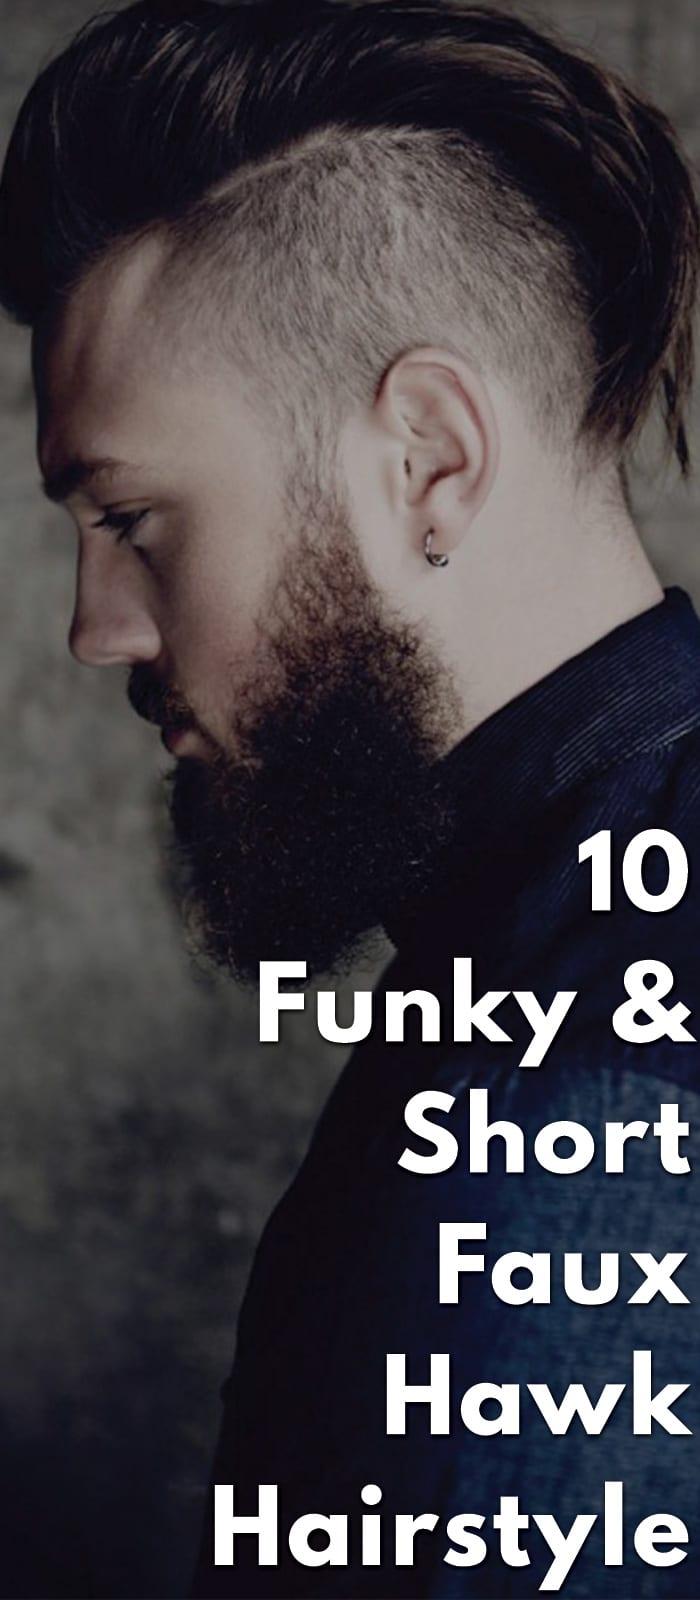 10-Funky-&-Short-Faux-Hawk-Hairstyle.